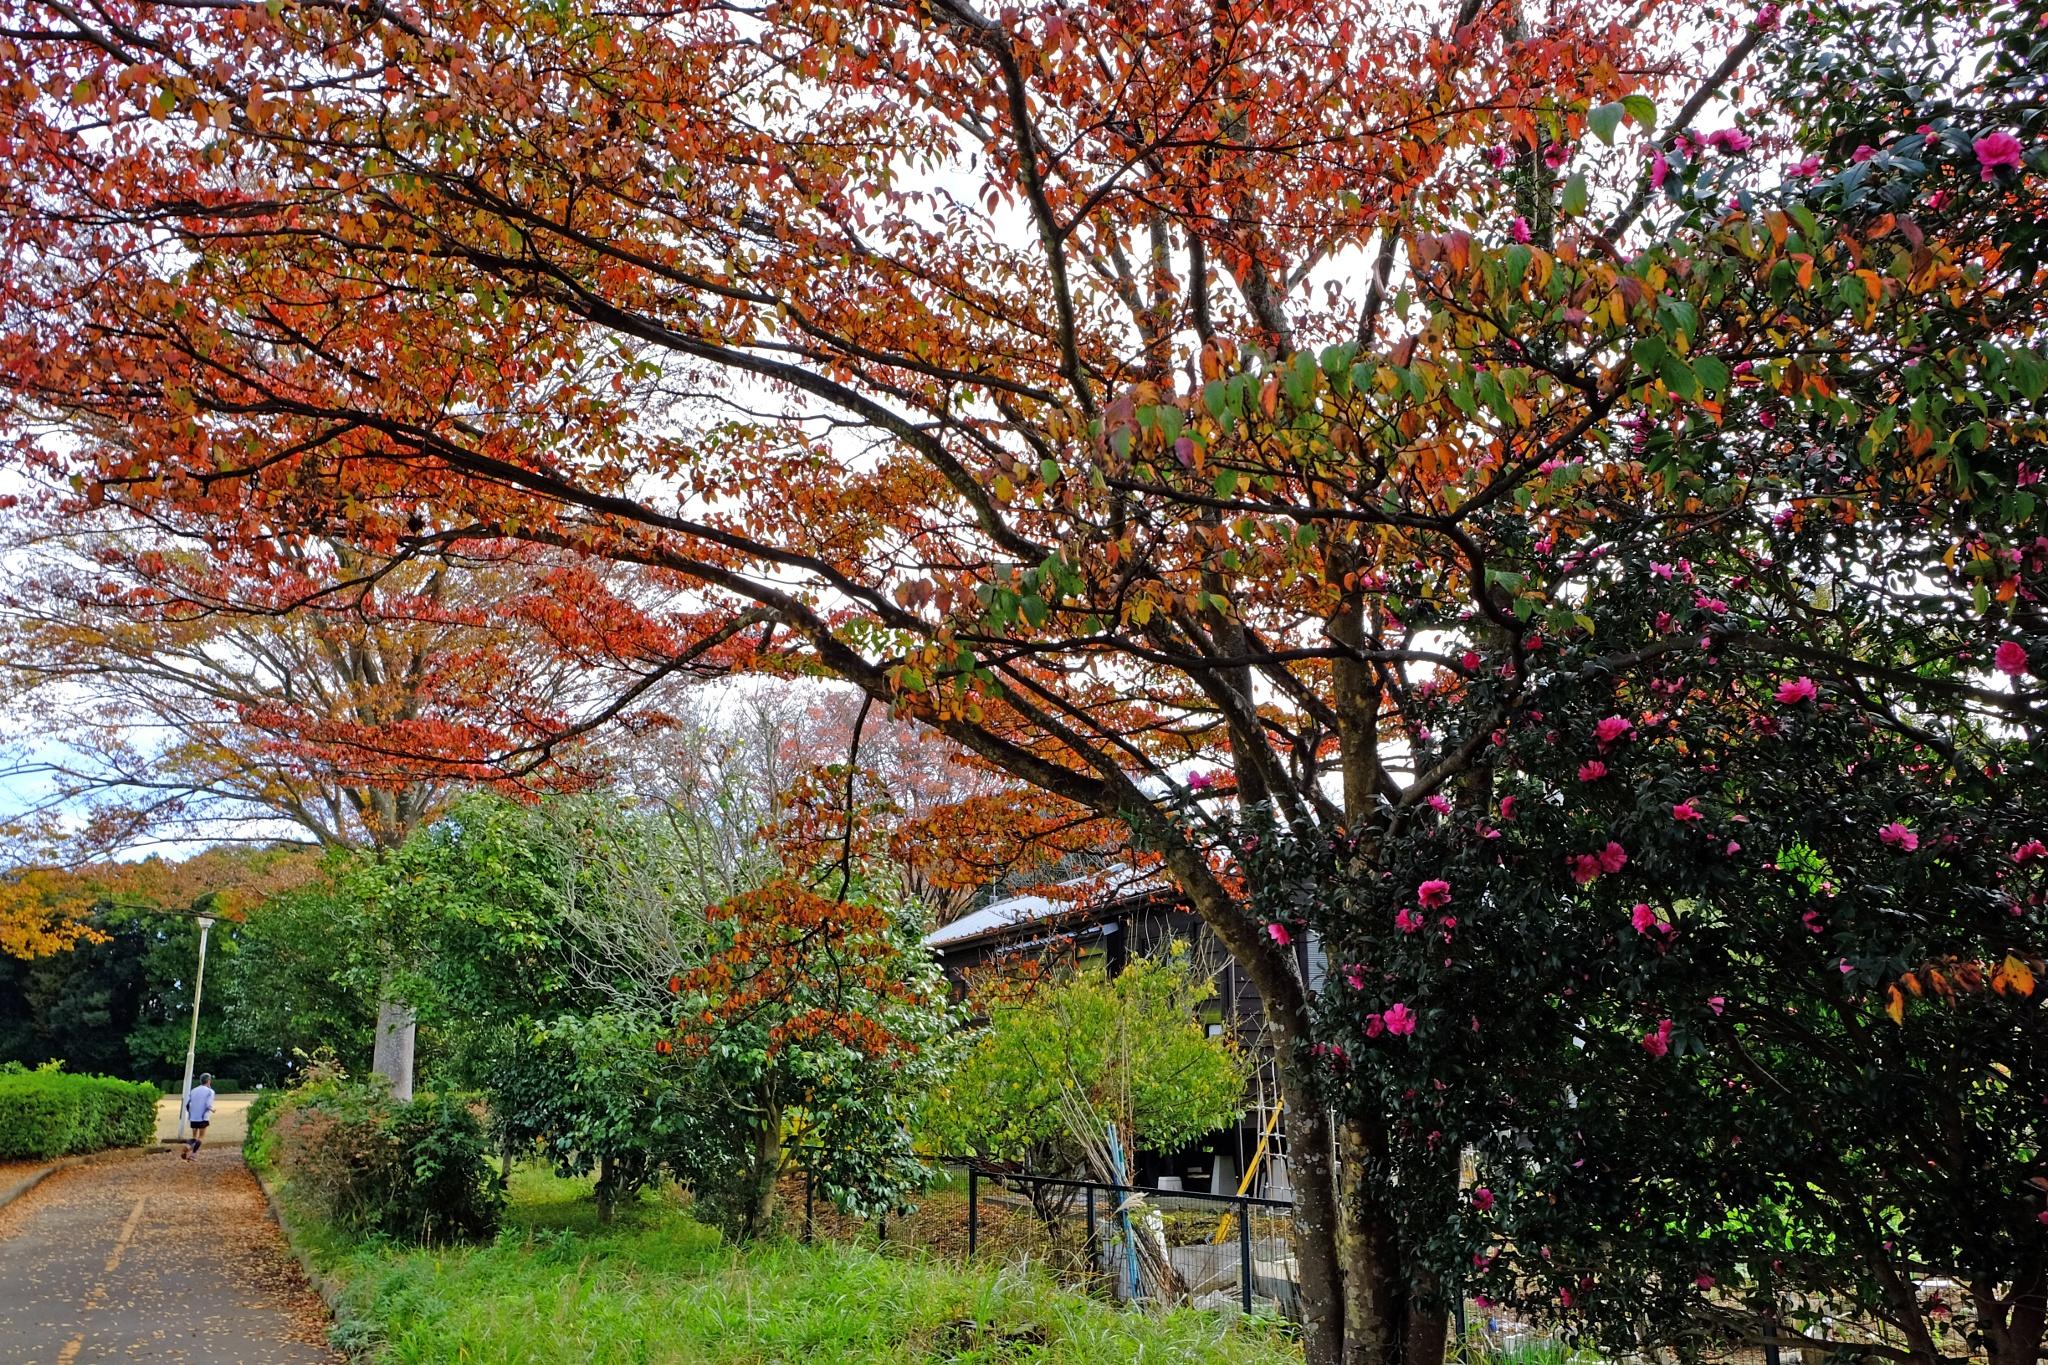 It runs through the autumn day by Kazuo Ishikawa